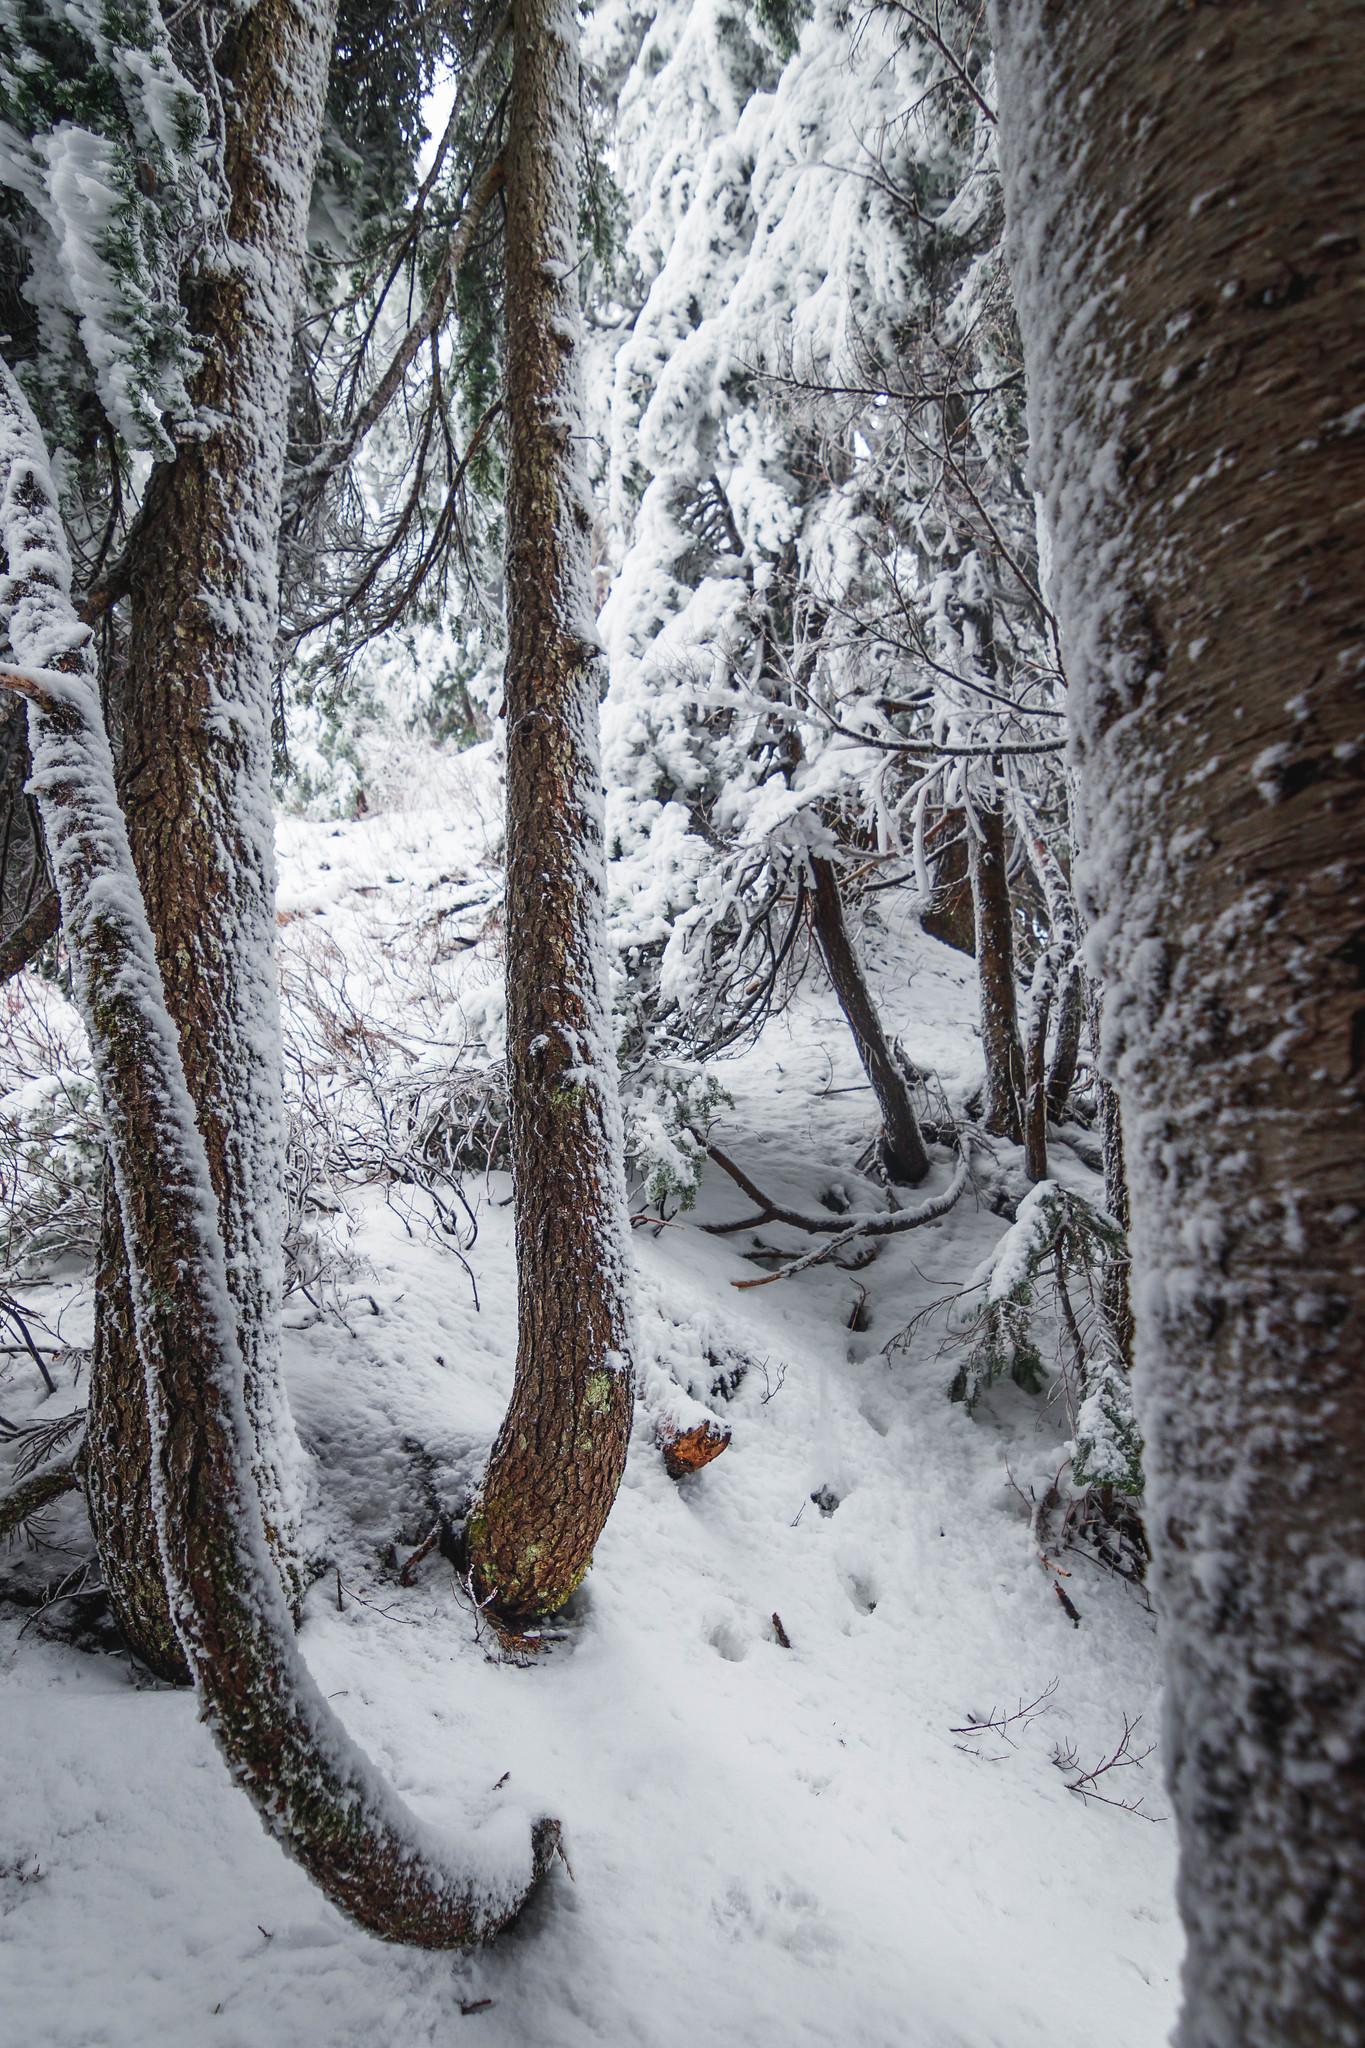 Lux Peak's woodsy north ridge